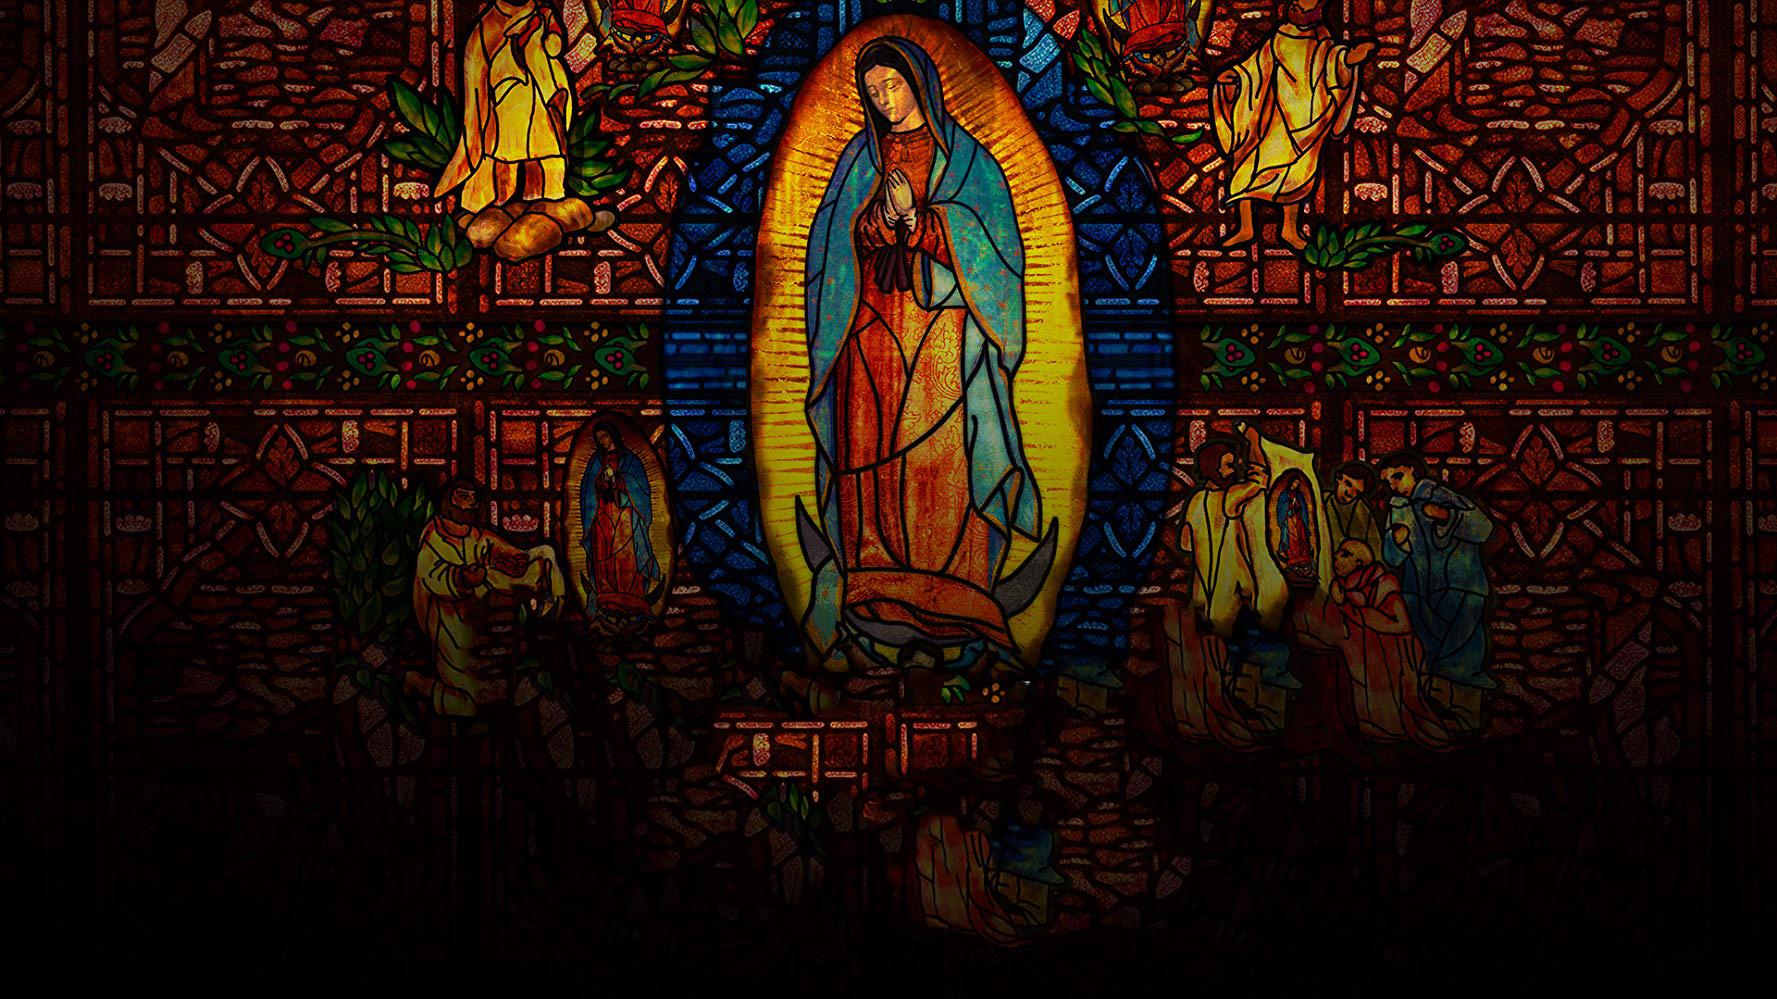 Botanica Virgen Morena